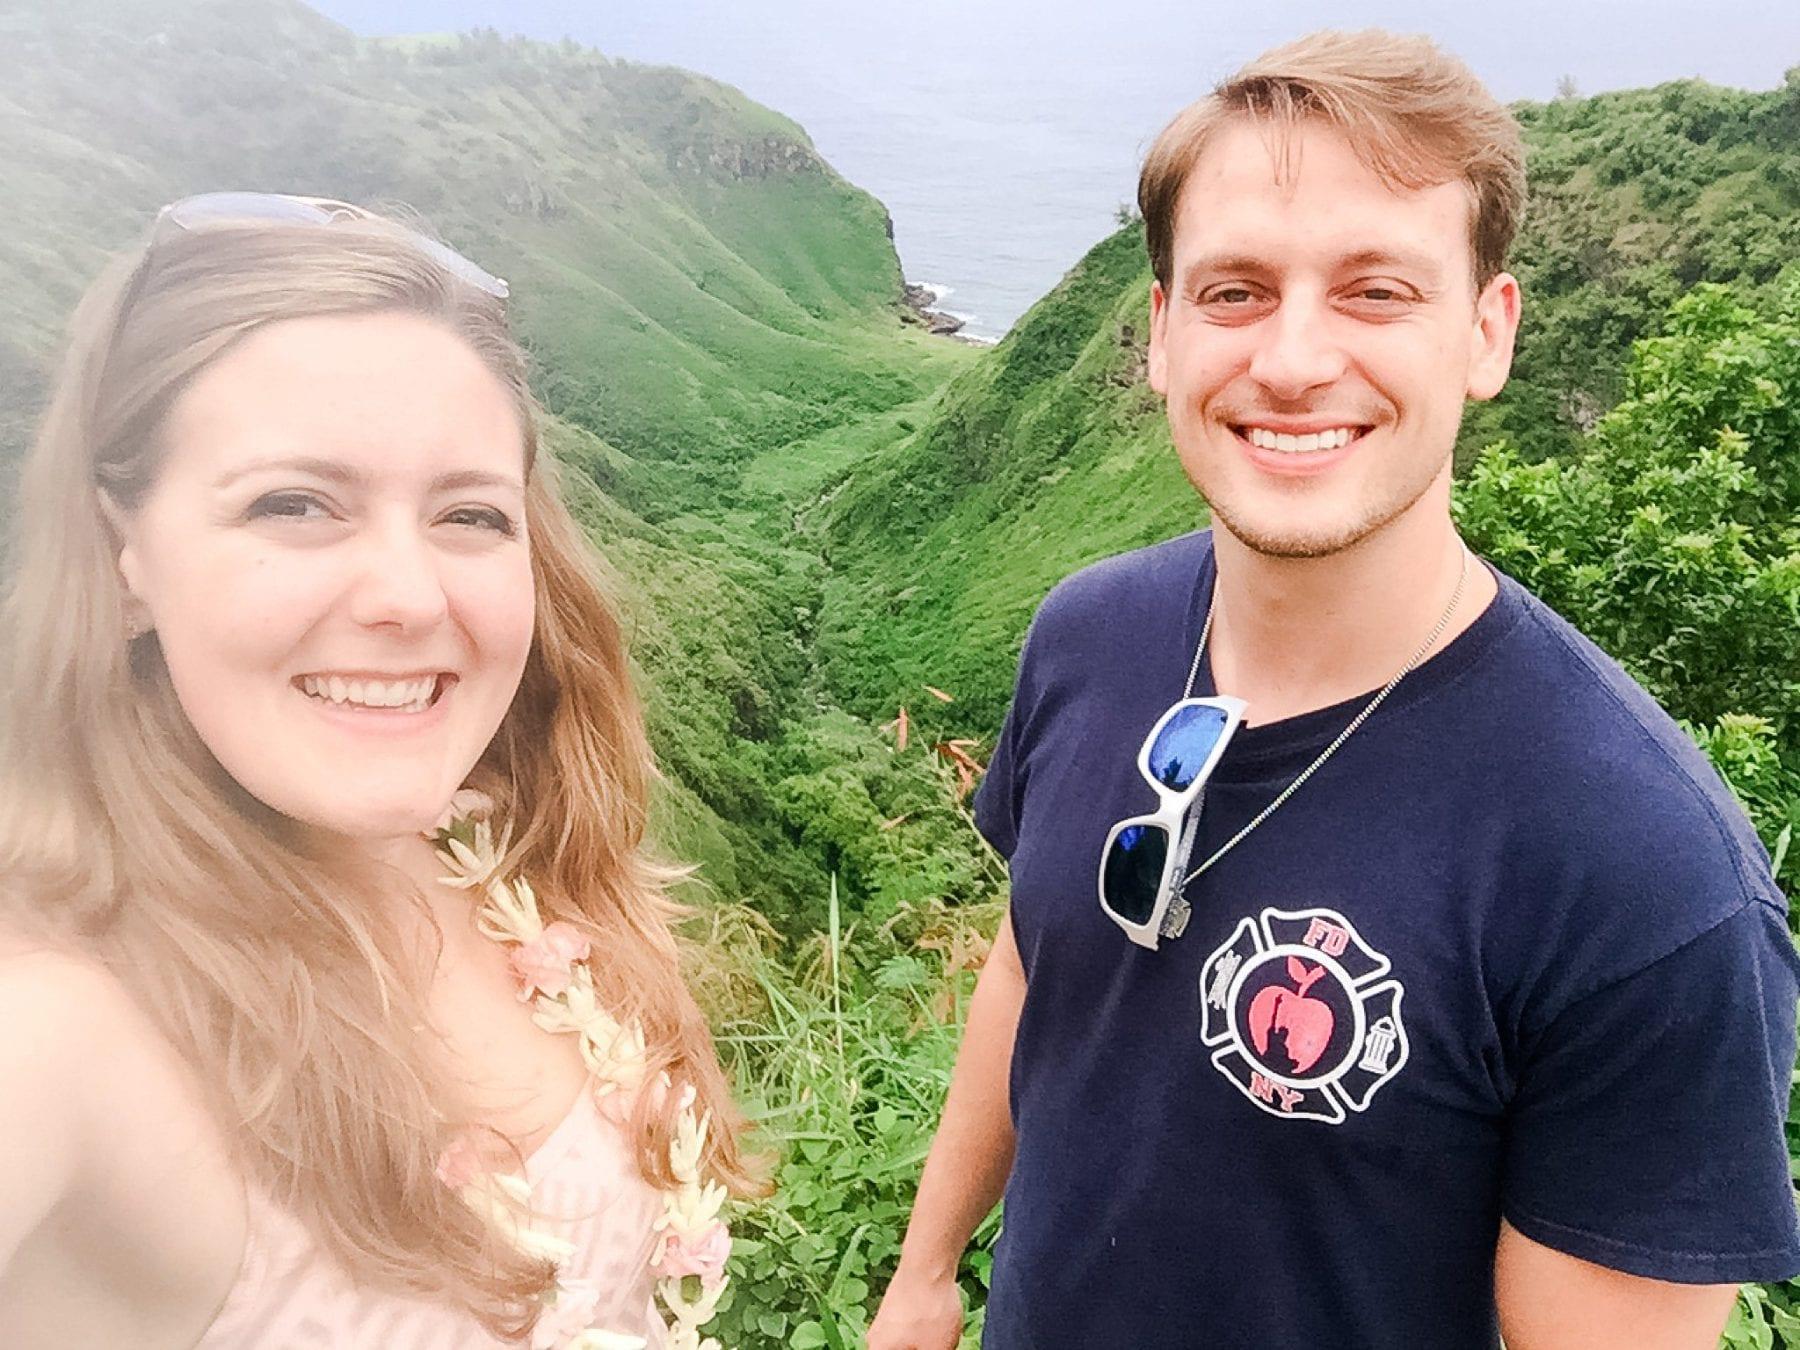 Hawaii Honeymoon Photos Megan & Justin Maui Vacation Things To Do iPhone-17.jpg